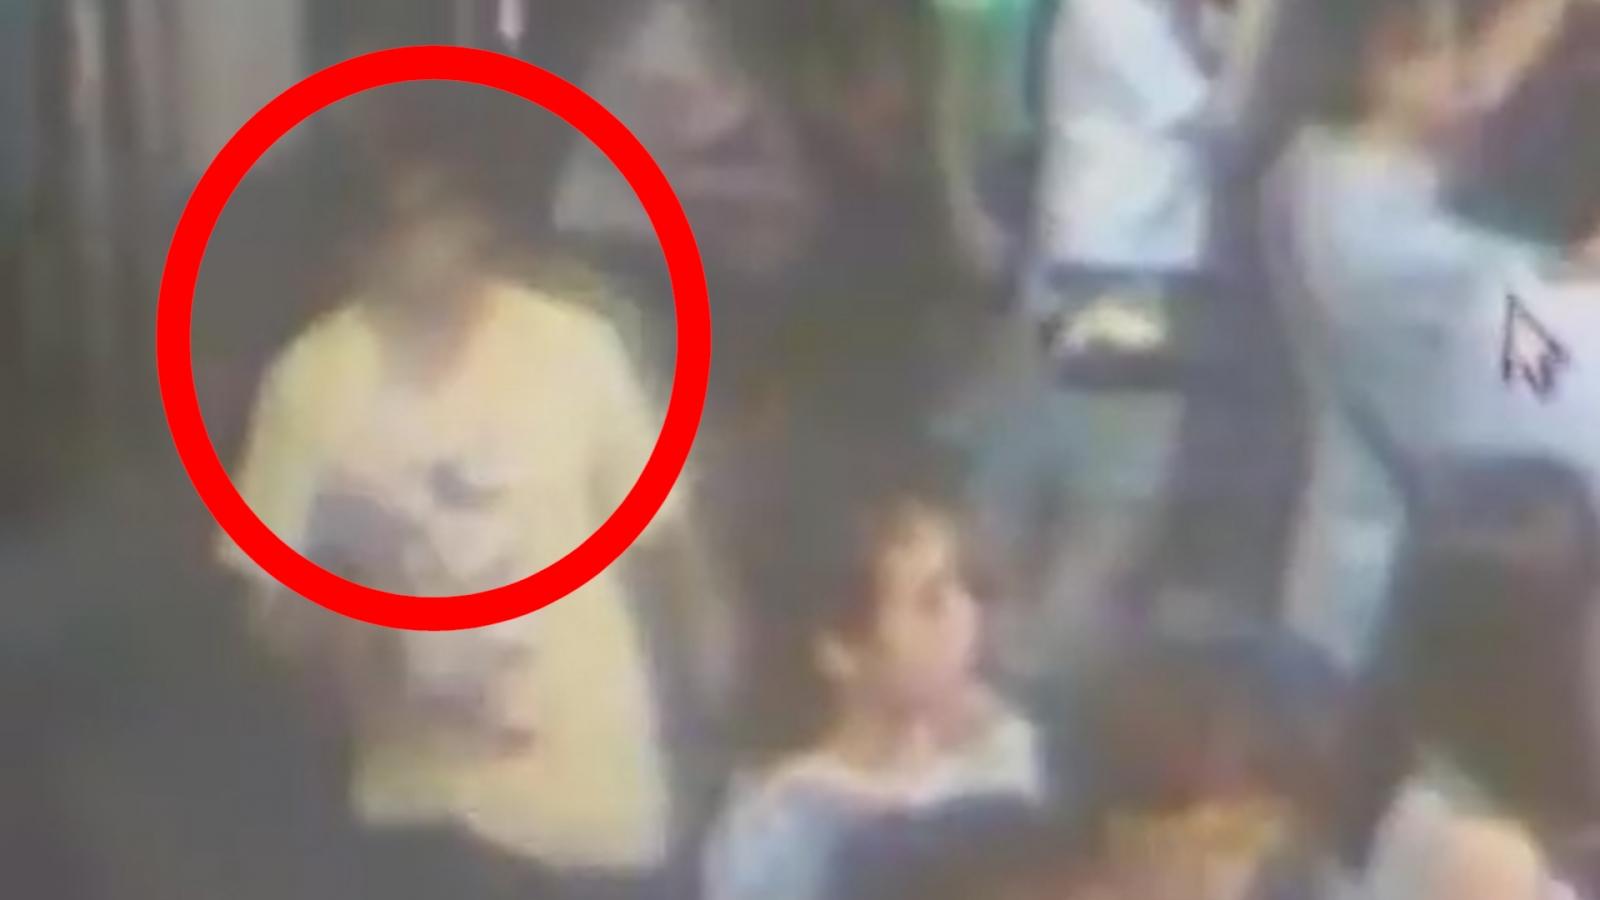 Bangkok bomb suspect